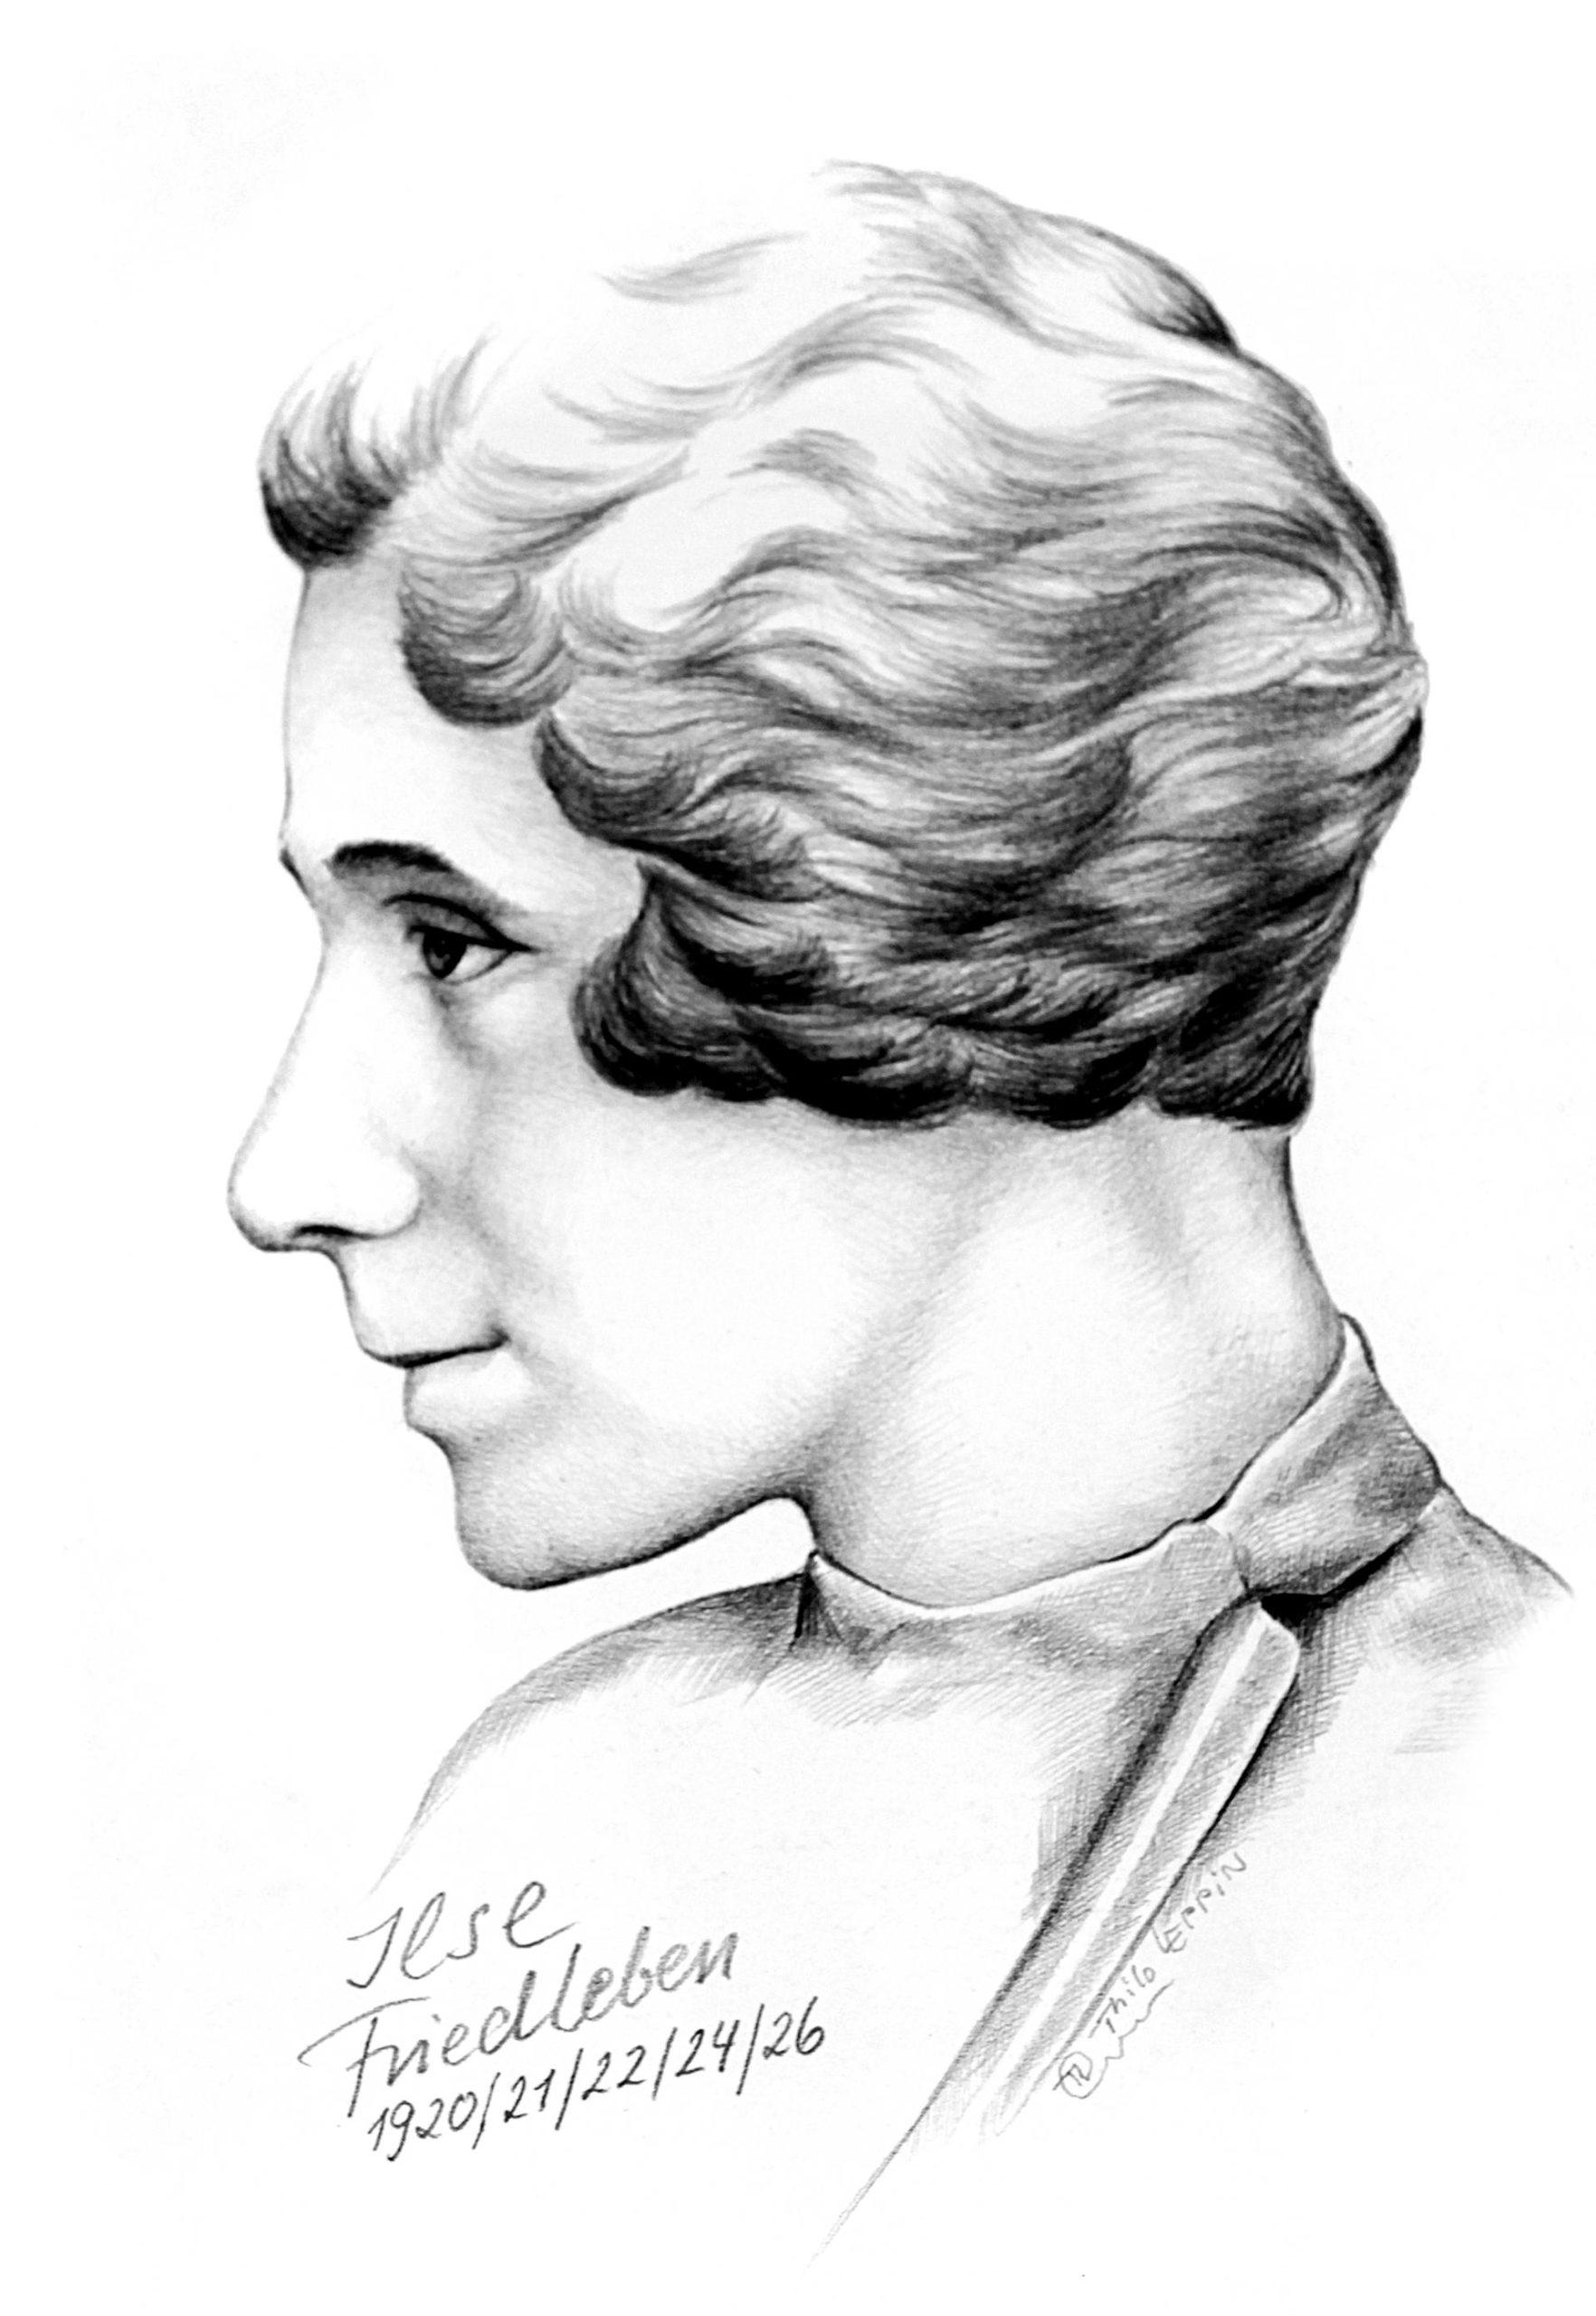 Ilse Friedleben